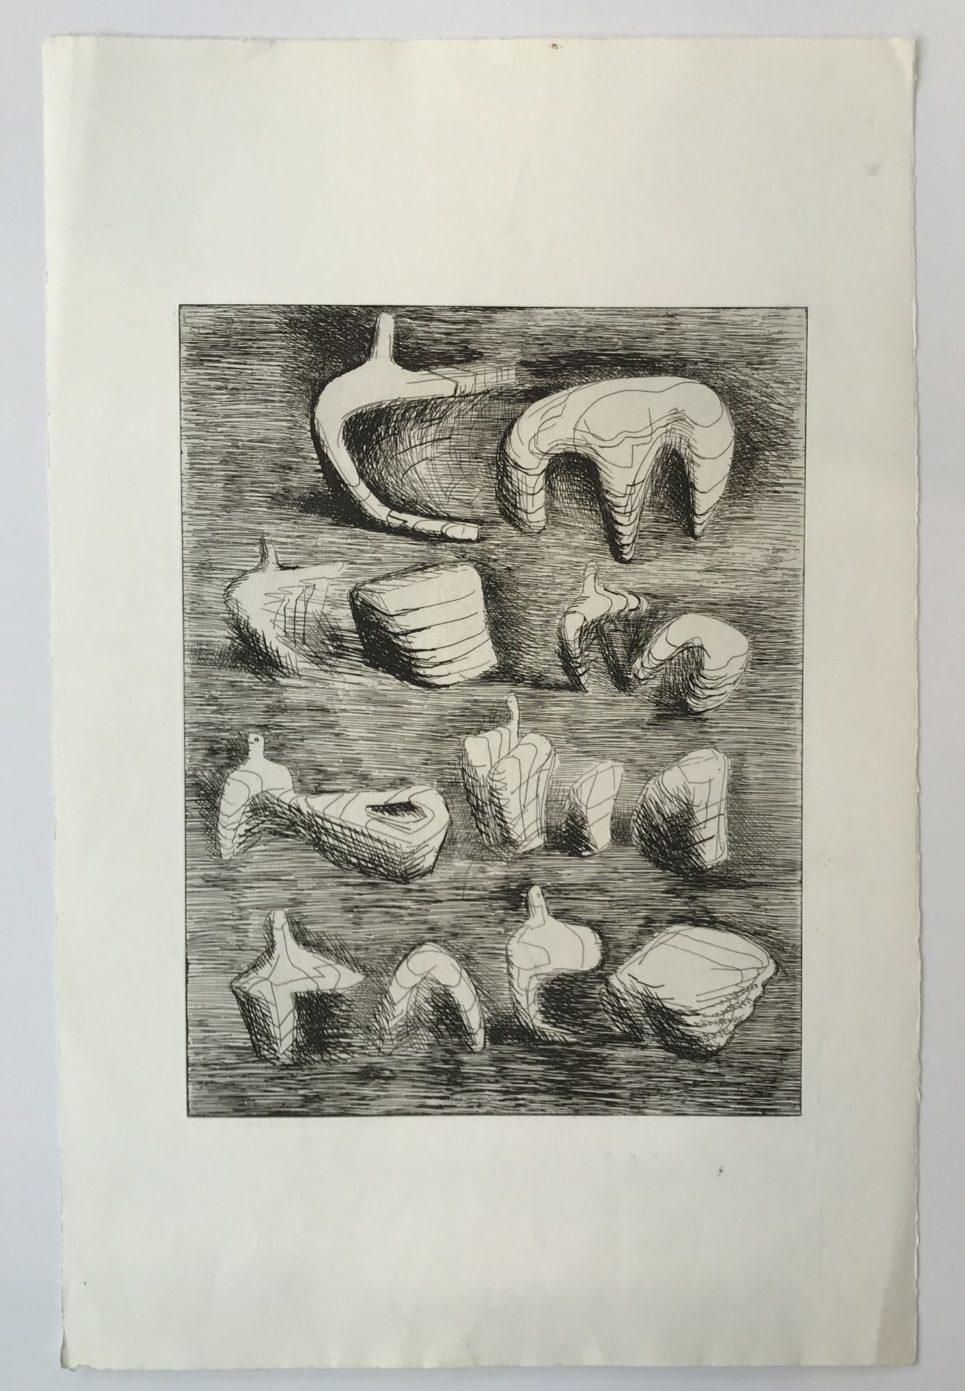 henry-moore-deconstructed-figures-c1970-full-paper